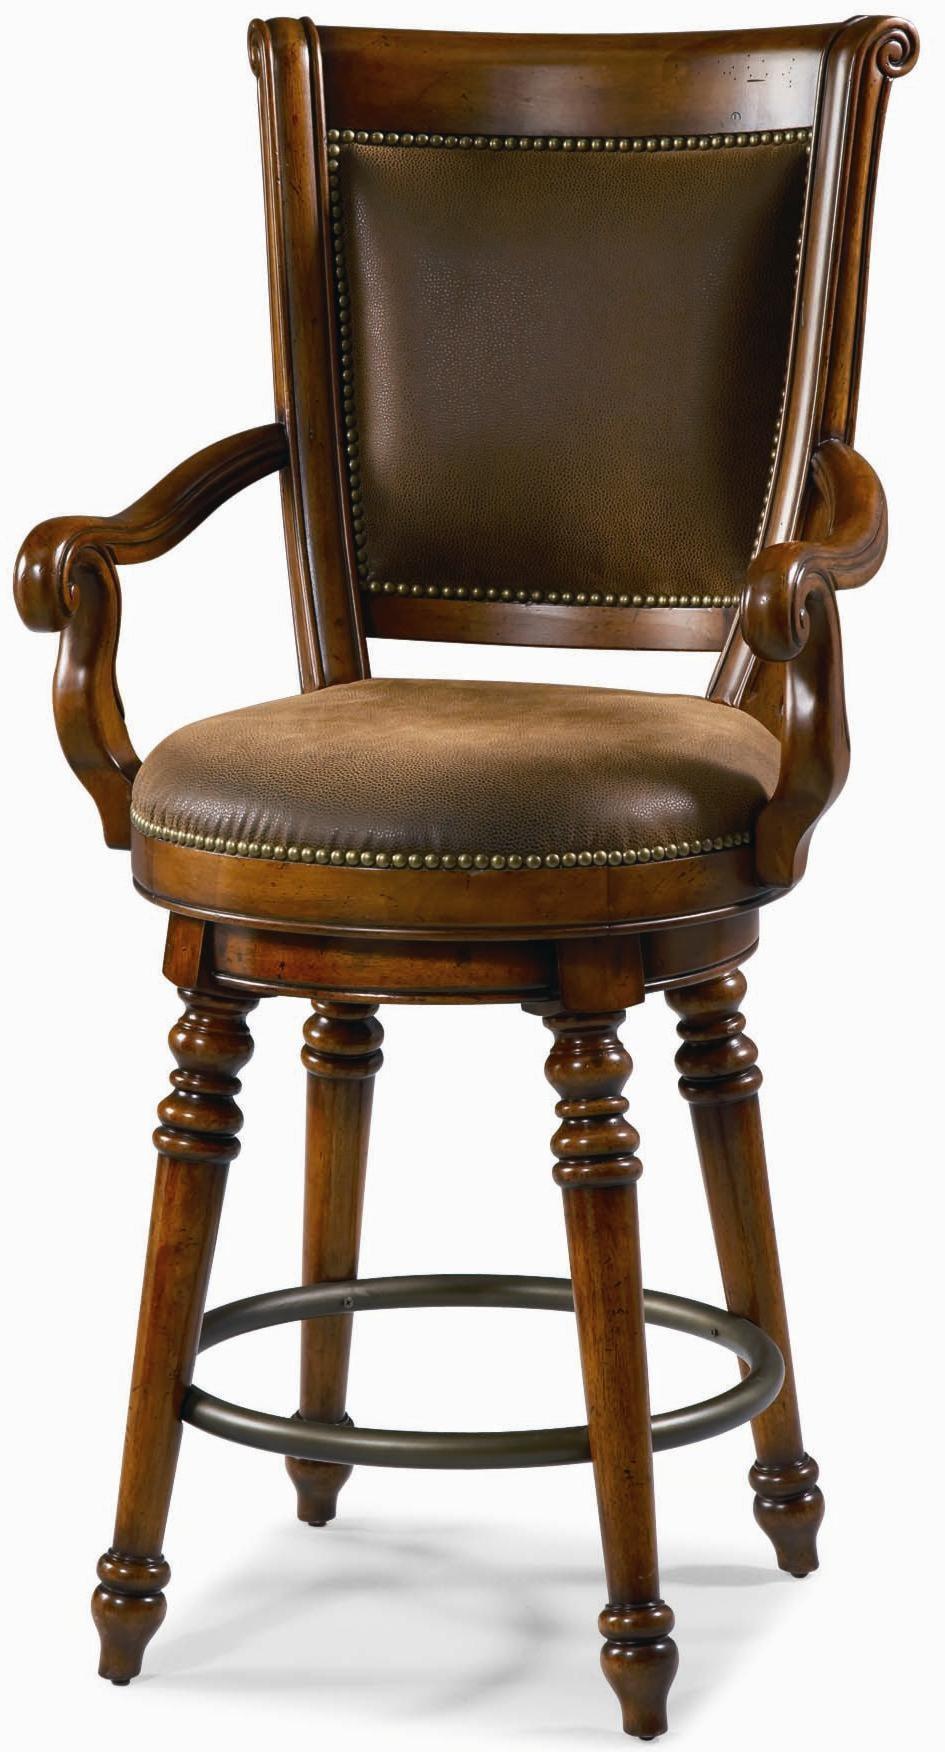 Hooker Furniture Waverly Place 26-Inch Swivel Counter Height Stool - Belfort Furniture - Bar Stool